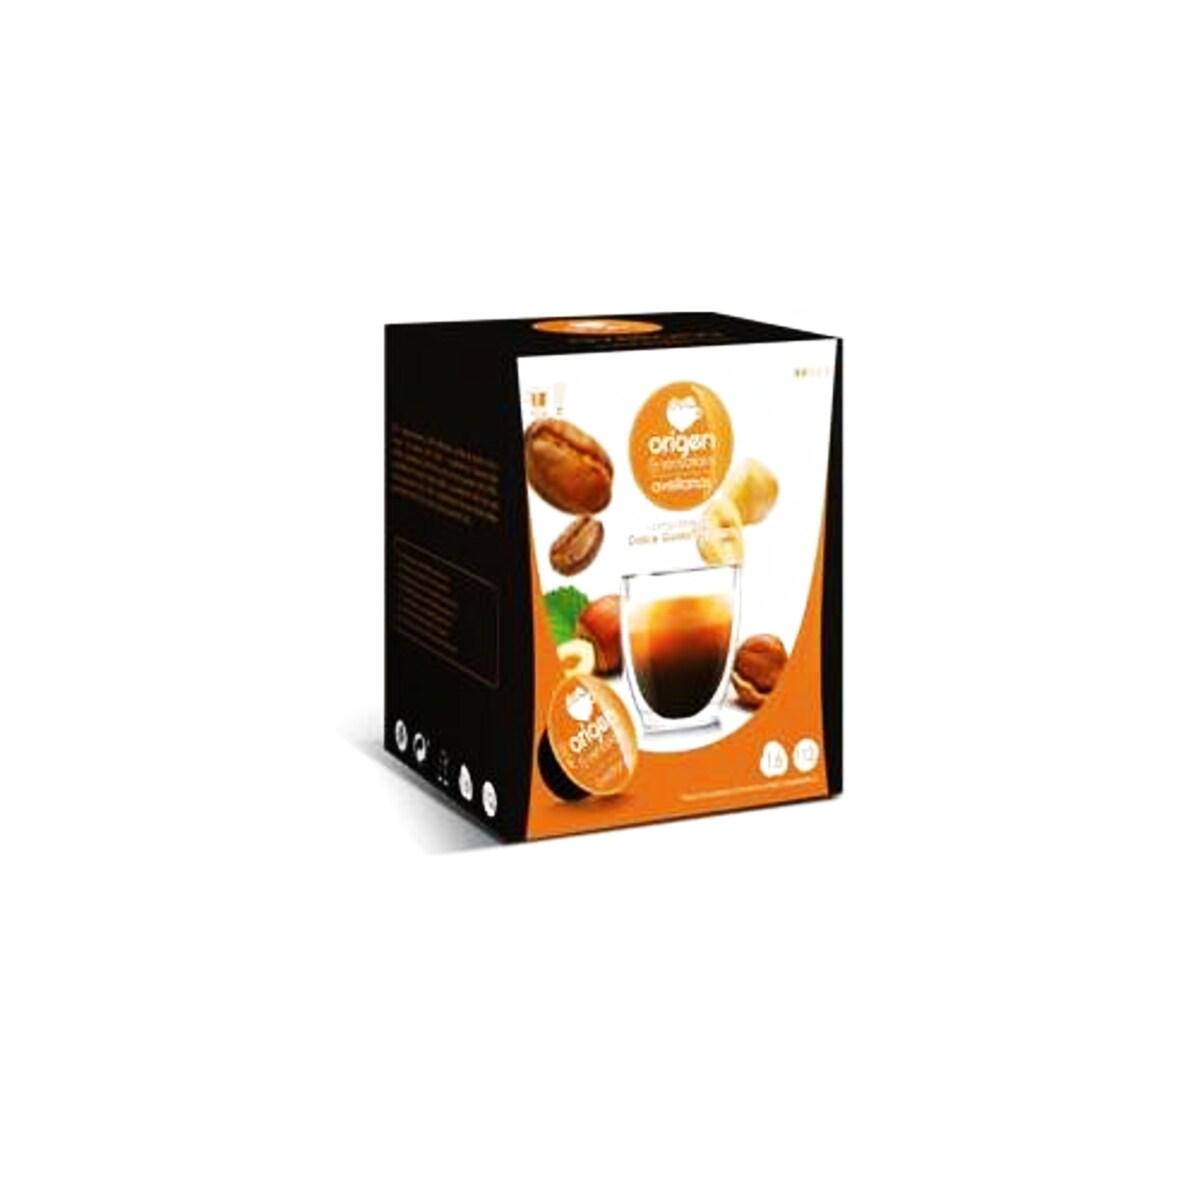 Origen Avellanas κάψουλες με γεύση φουντούκι για Dolce Gusto μηχανή καφέ